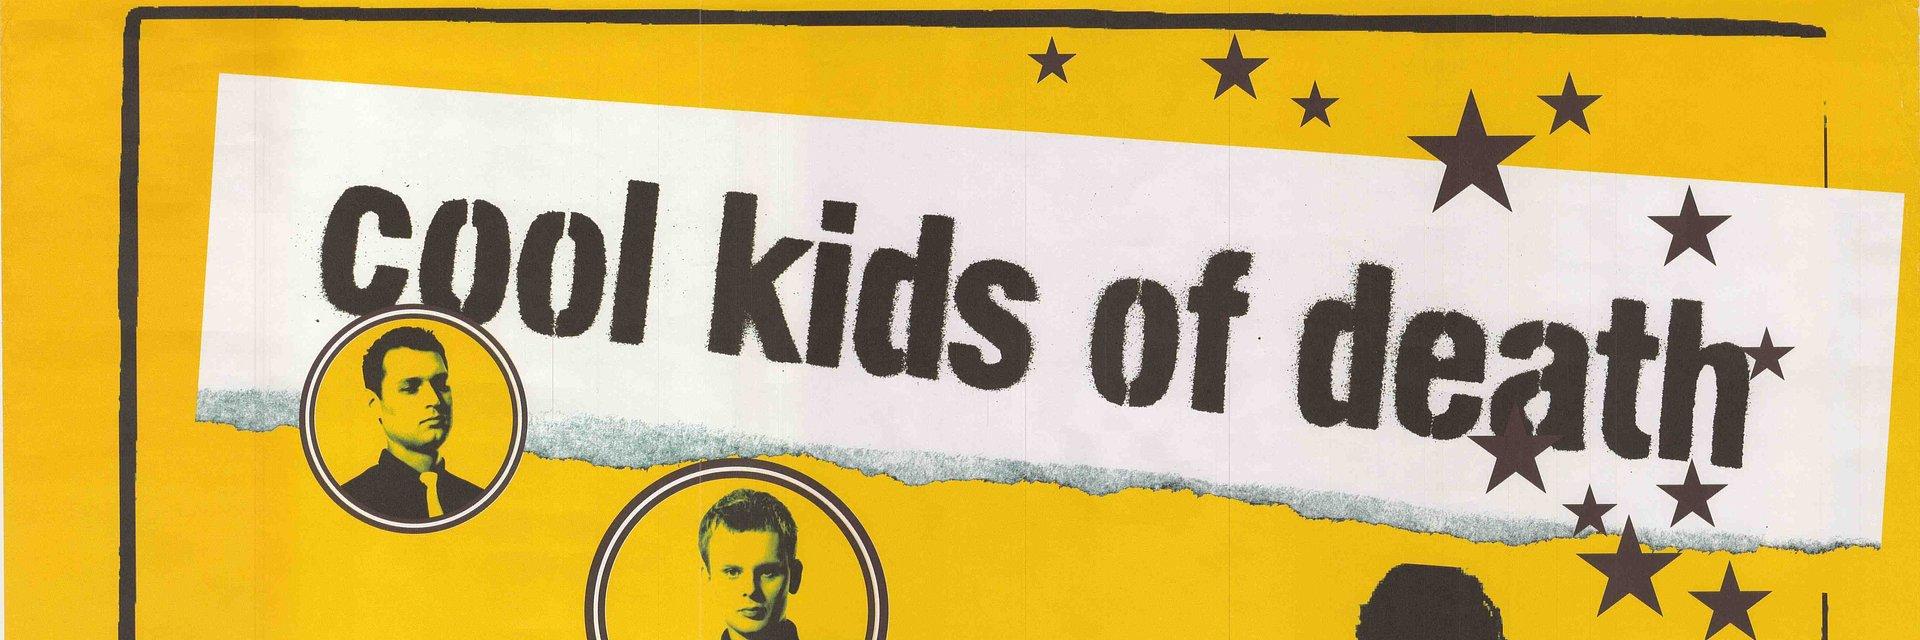 Albumy Cool Kids of Death w serwisach streamingowych